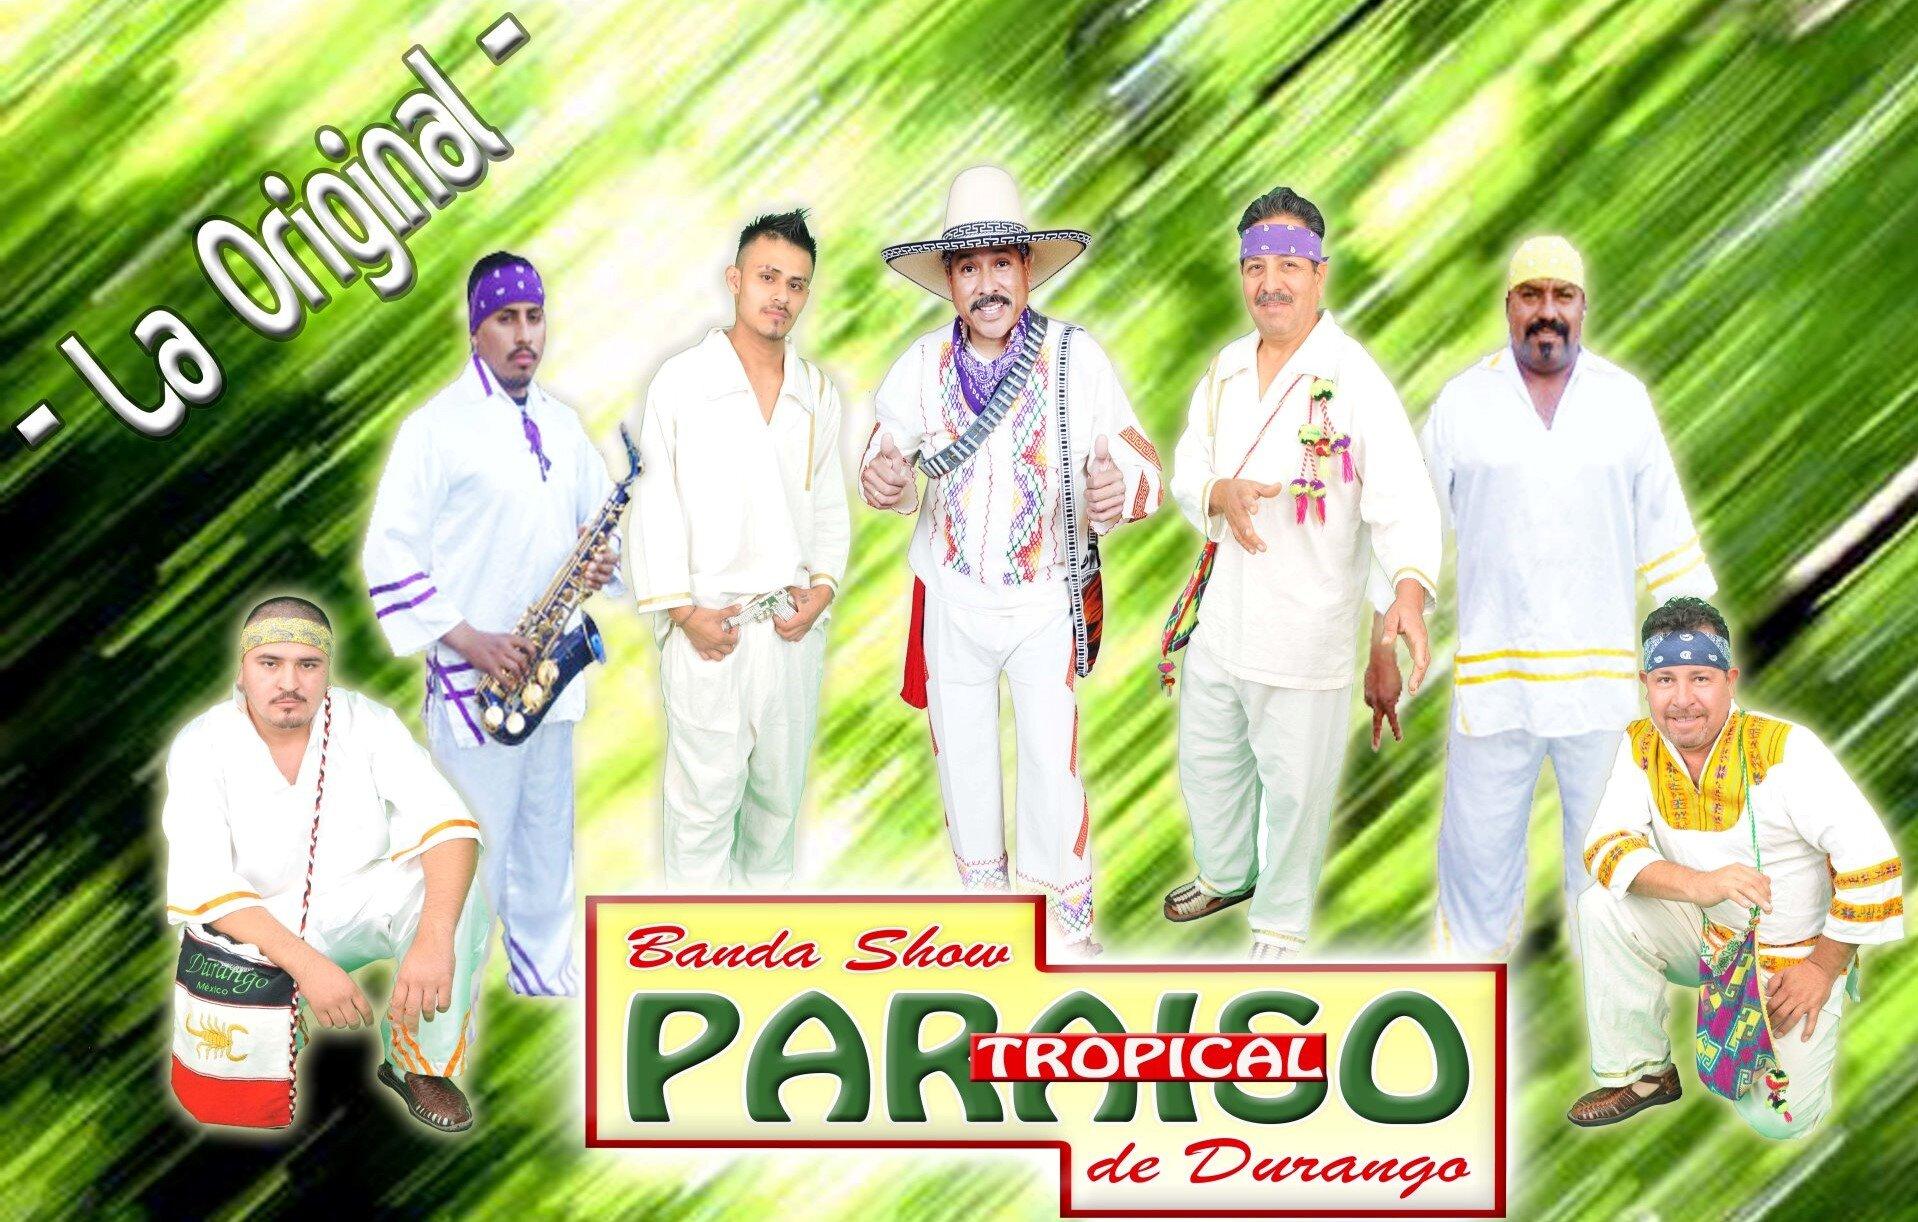 cover_Banda Show Paraiso Tropical.jpg